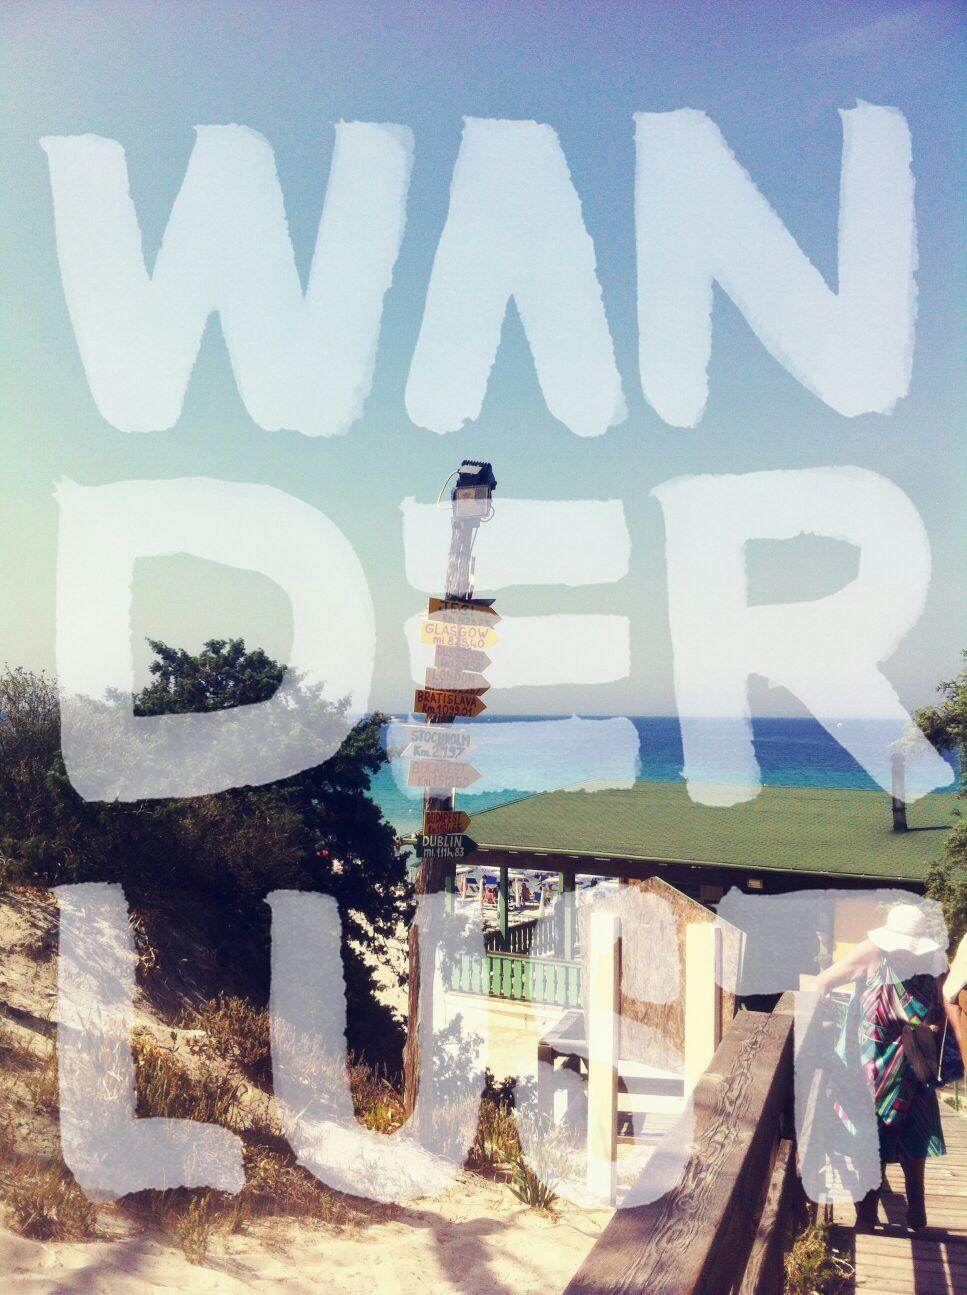 Wanderlust - Rubrica Viaggi - Aprile 2016